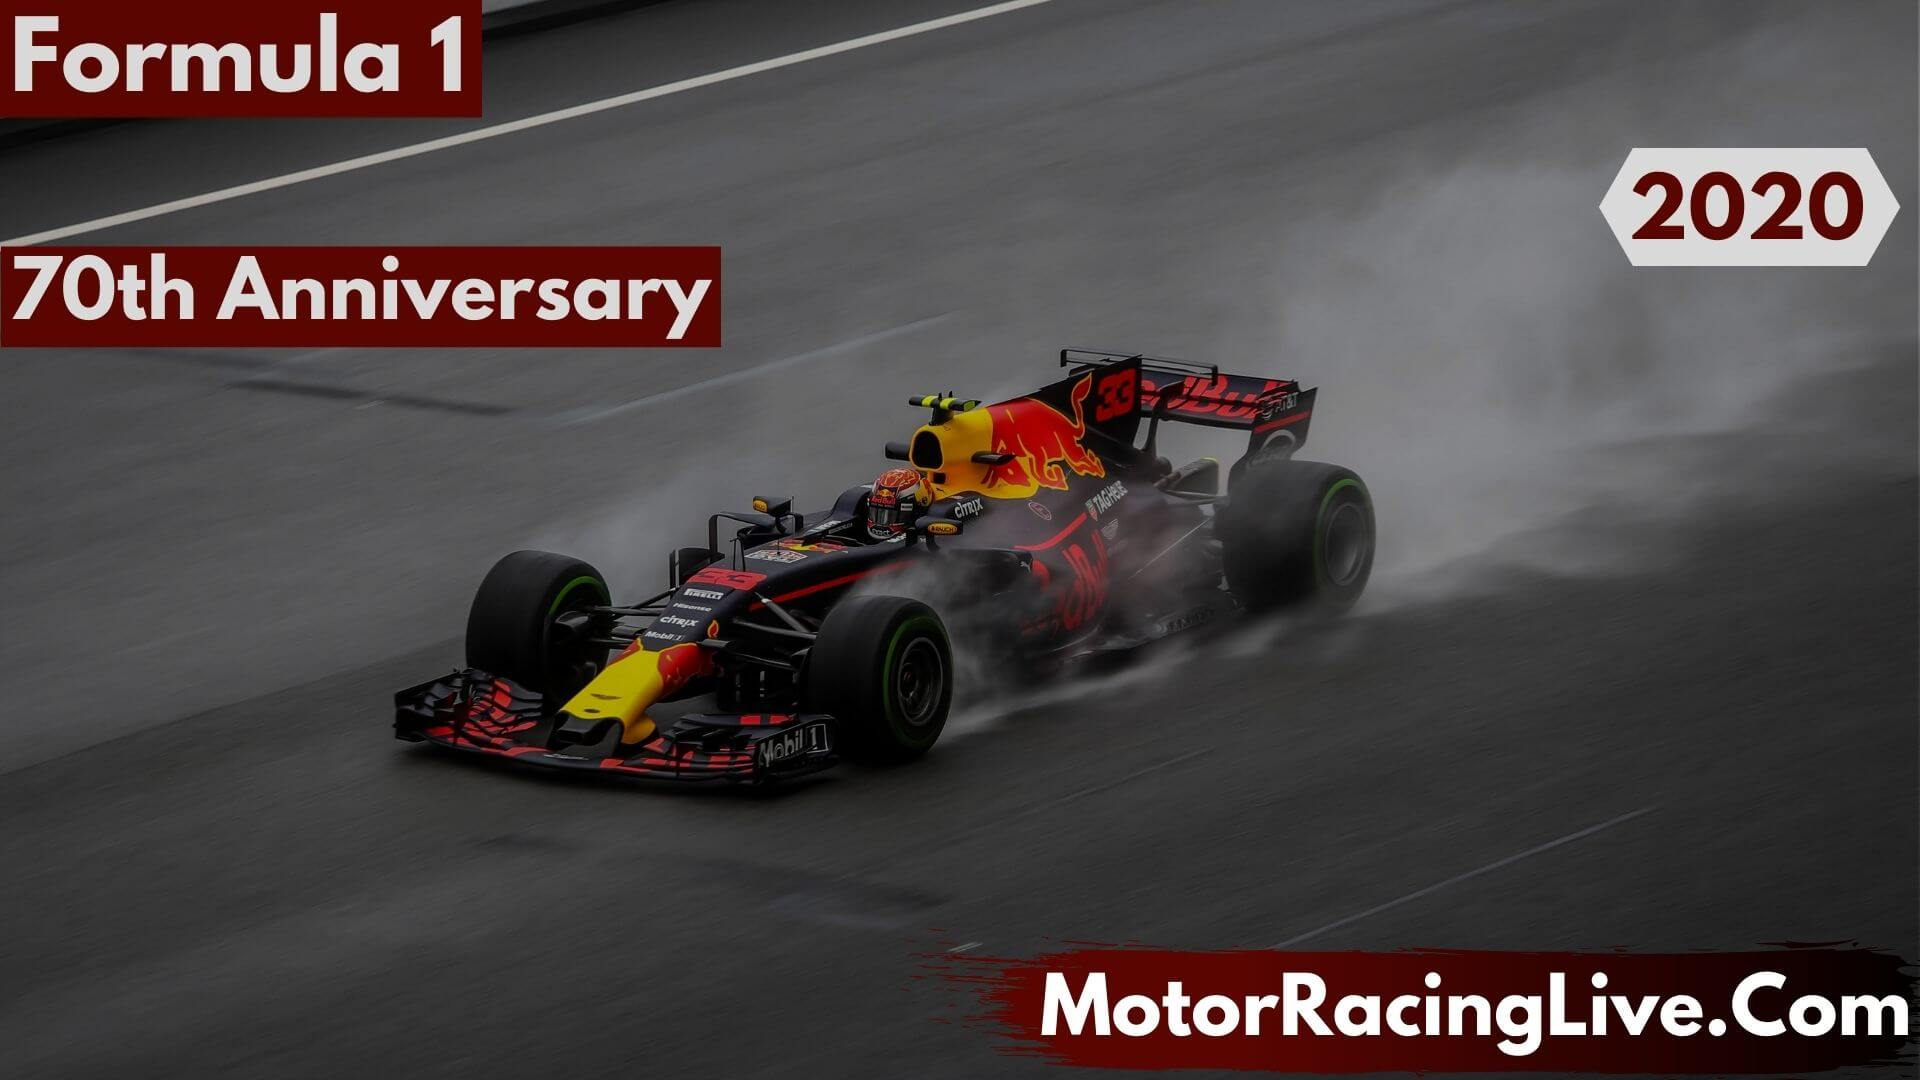 watch-70th-anniversary-formula-1-grand-prix-live